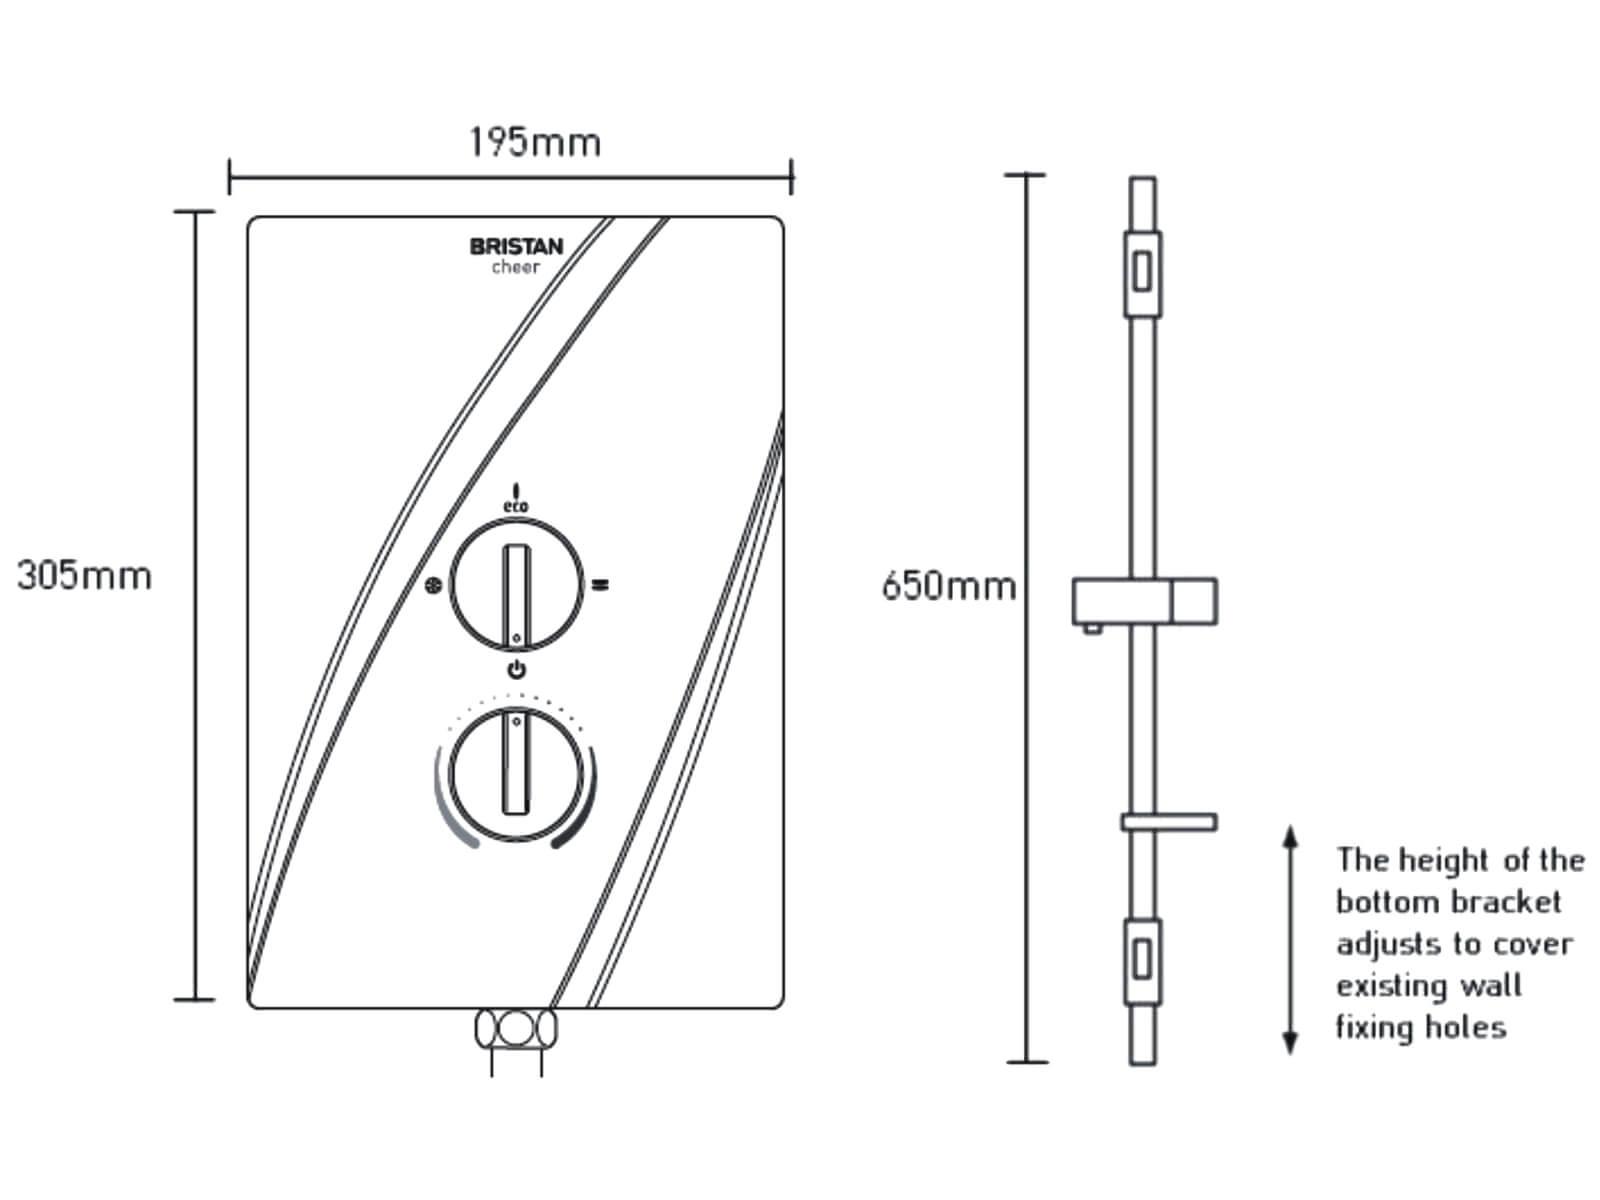 Bristan Smile Electric Shower White 8.5kw New Cover Design UK Stocks